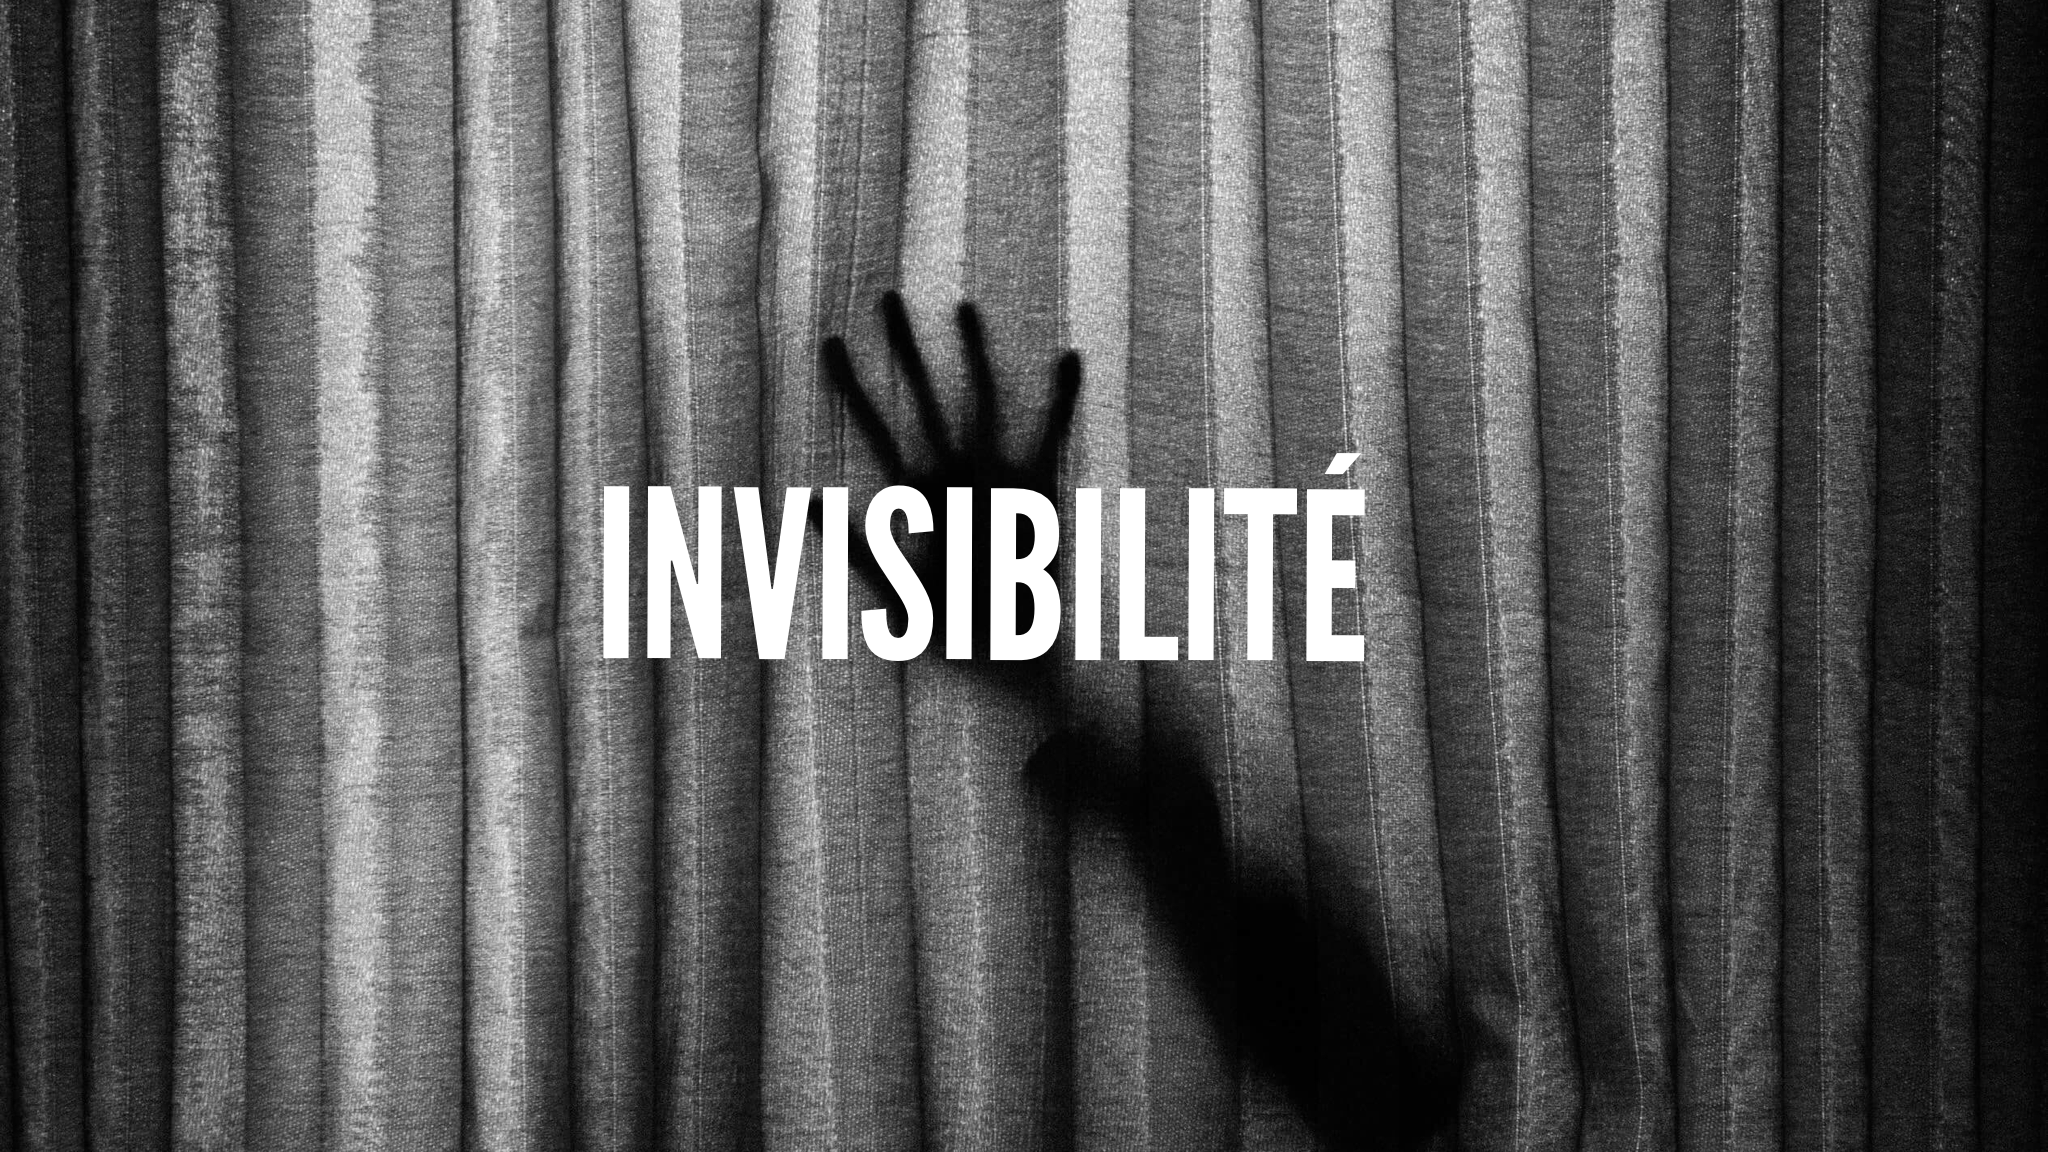 Karolann texte invisibilité